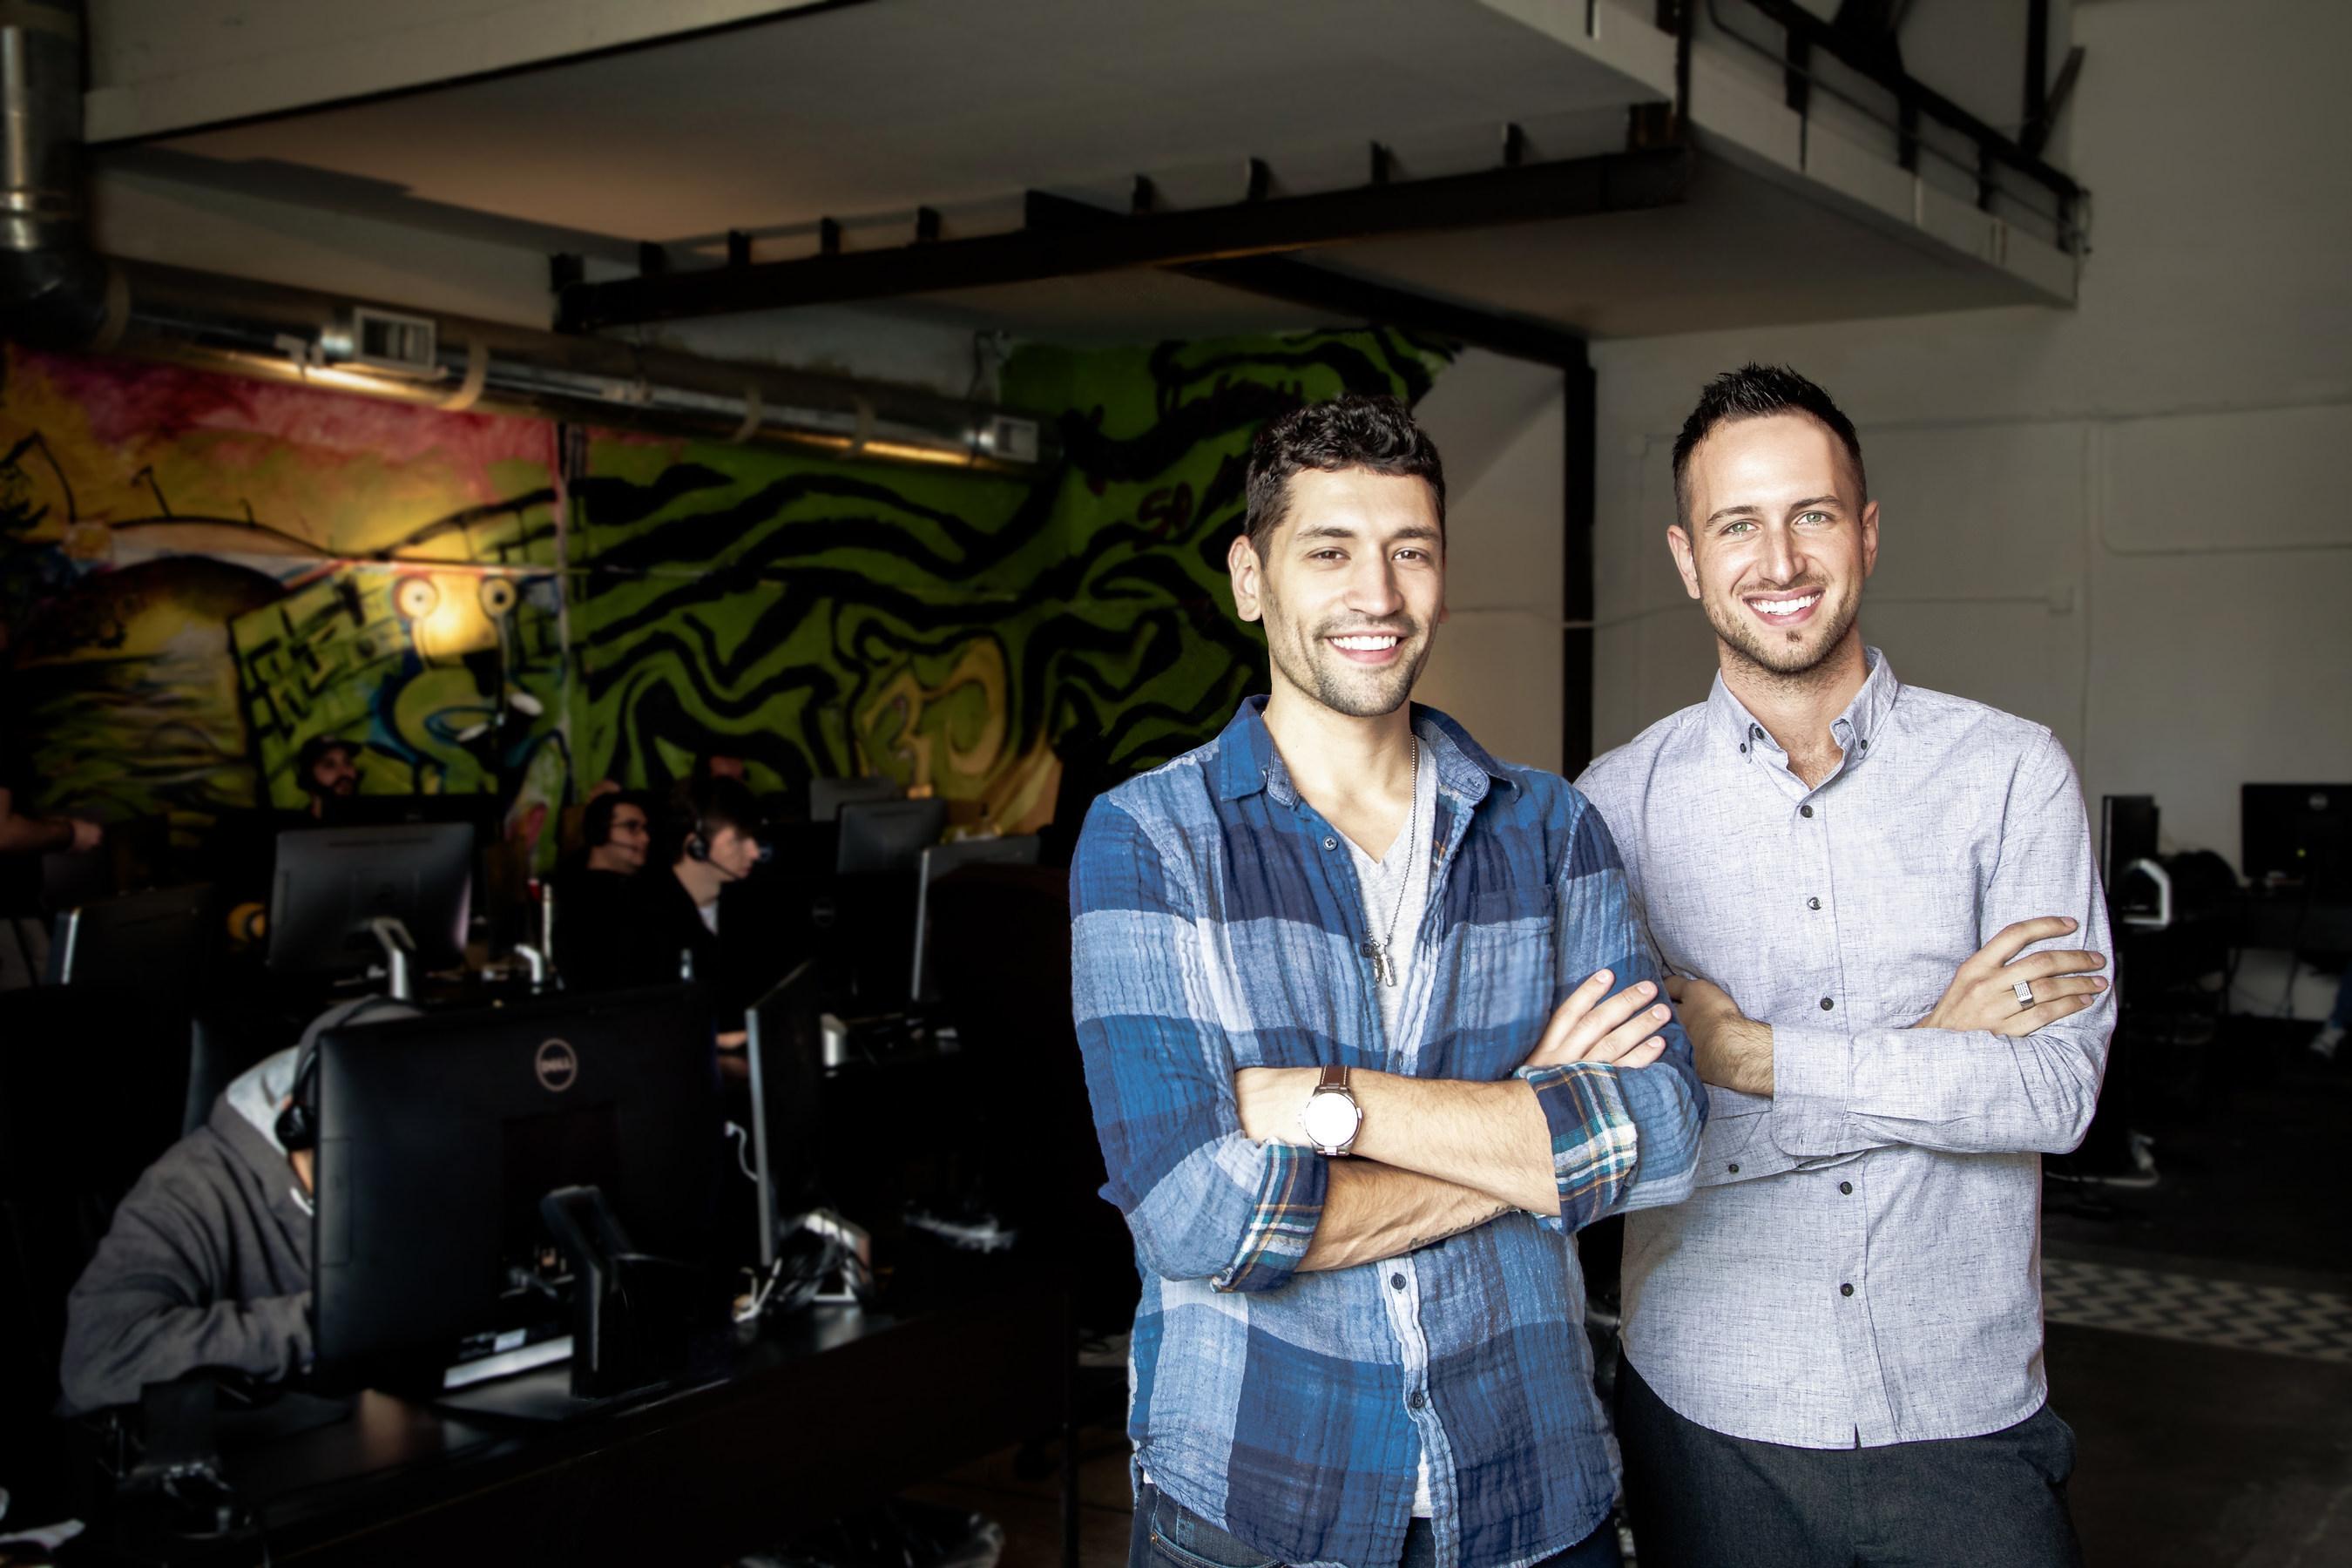 The Zebra CEO Adam Lyons and COO Joshua Dziabiak